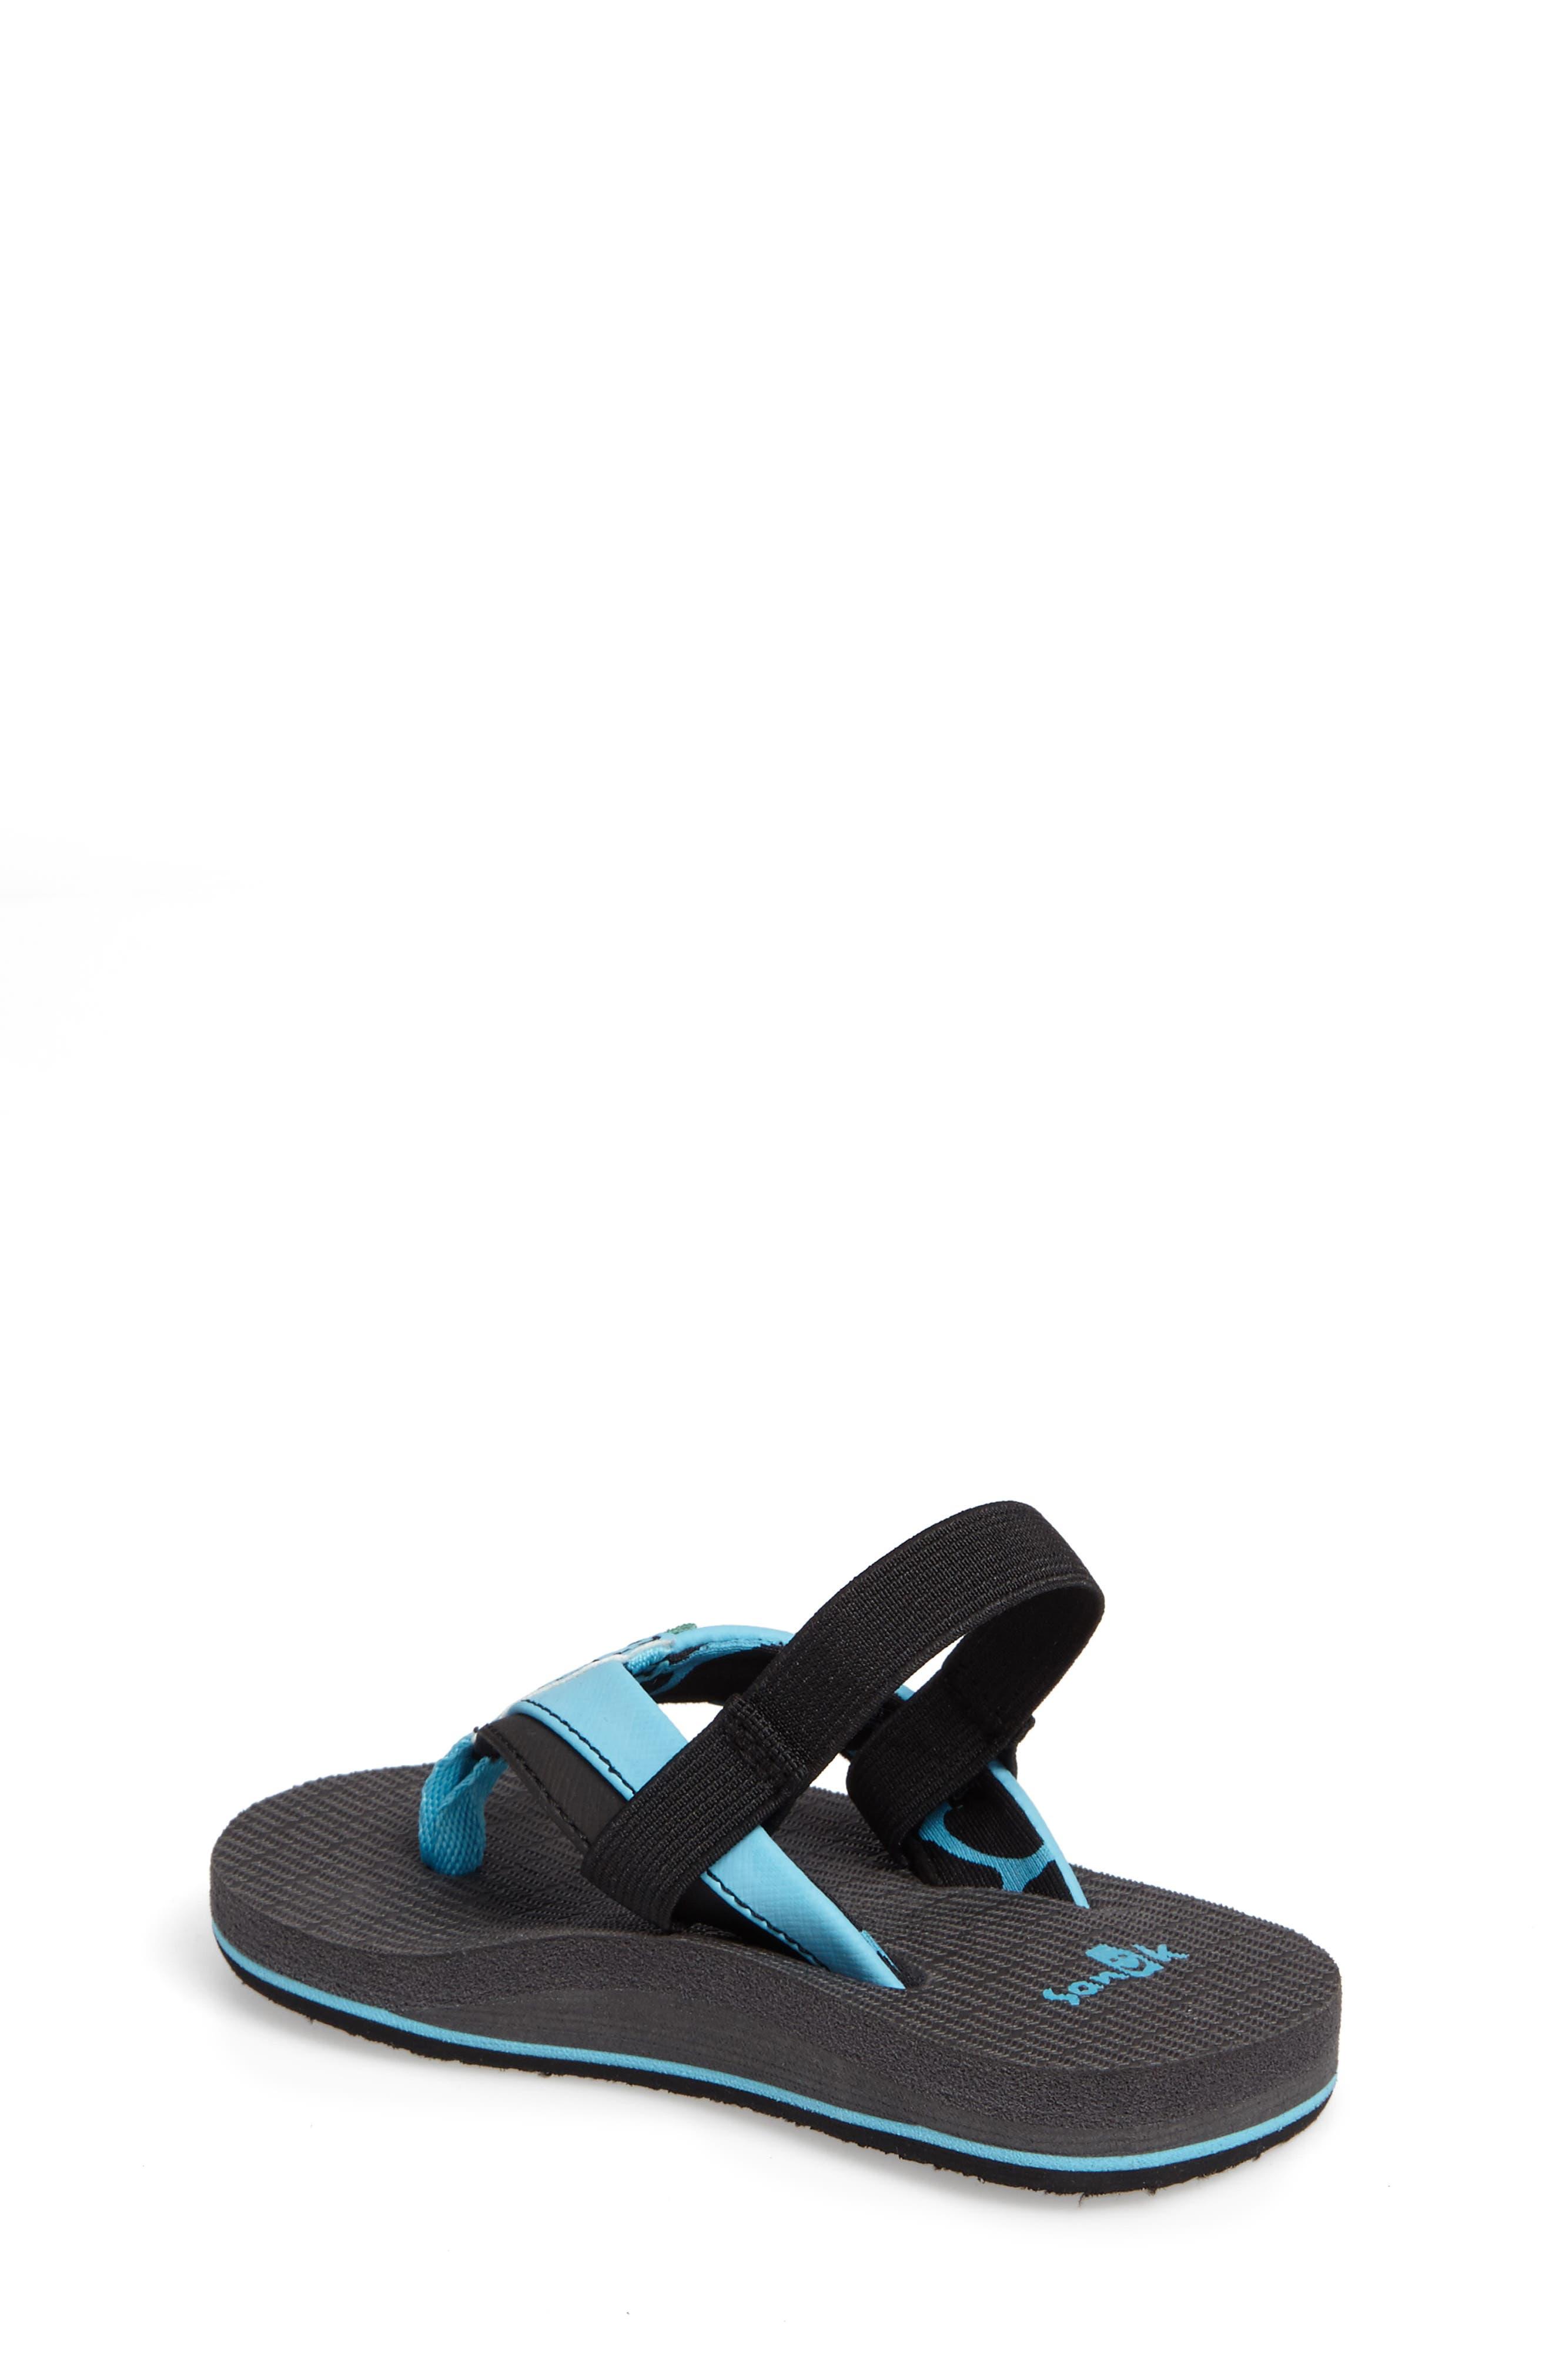 'Rootbeer Cozy' Lightweight Flip Flop Sandal,                             Alternate thumbnail 2, color,                             Aqua/ Black